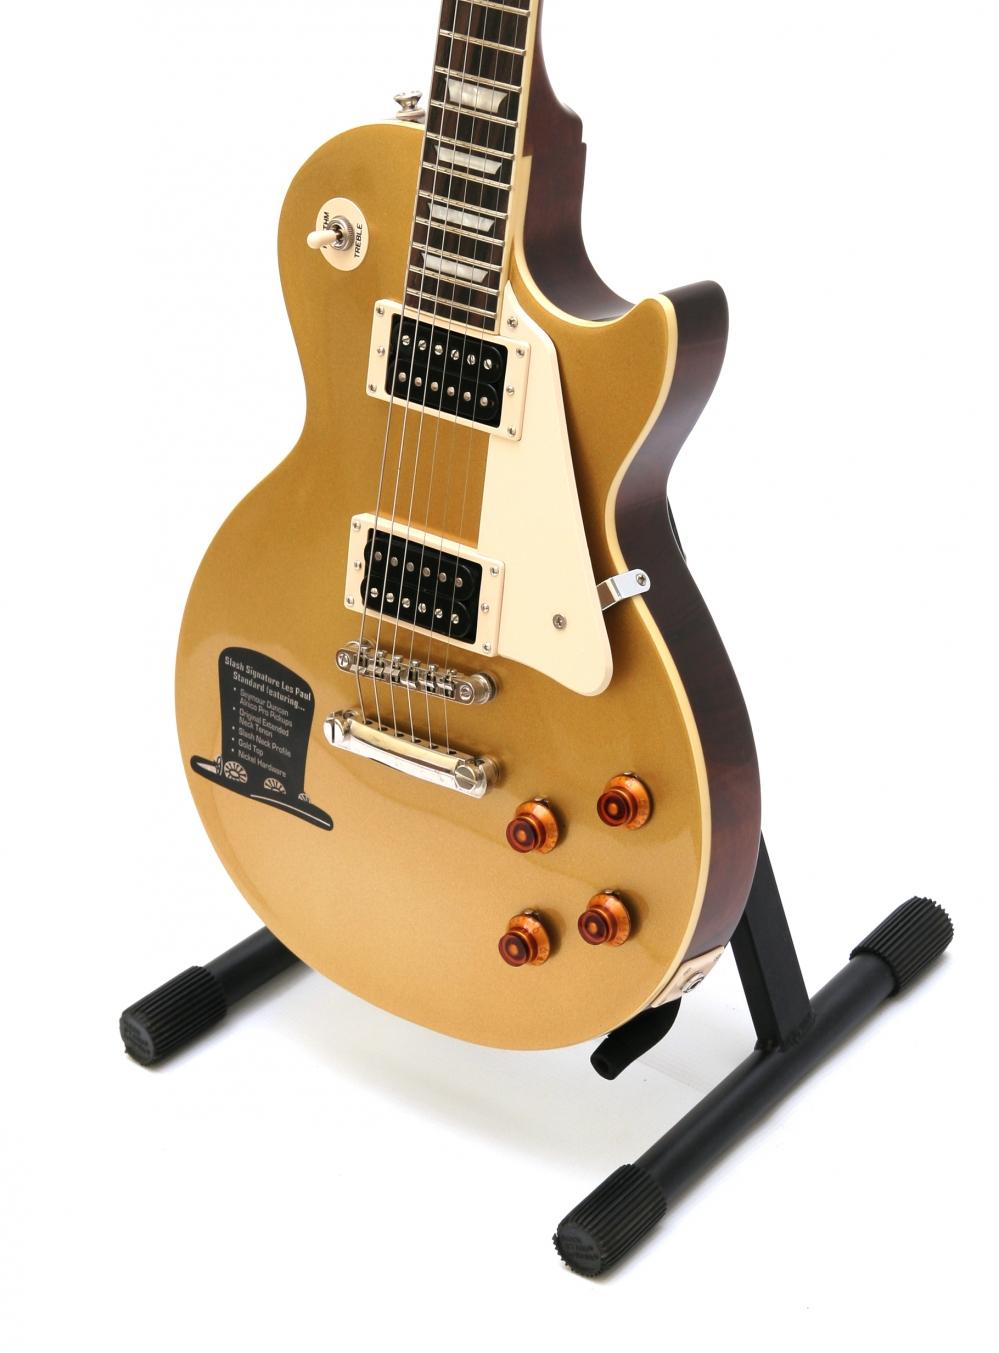 epiphone les paul slash gold top electric guitar. Black Bedroom Furniture Sets. Home Design Ideas